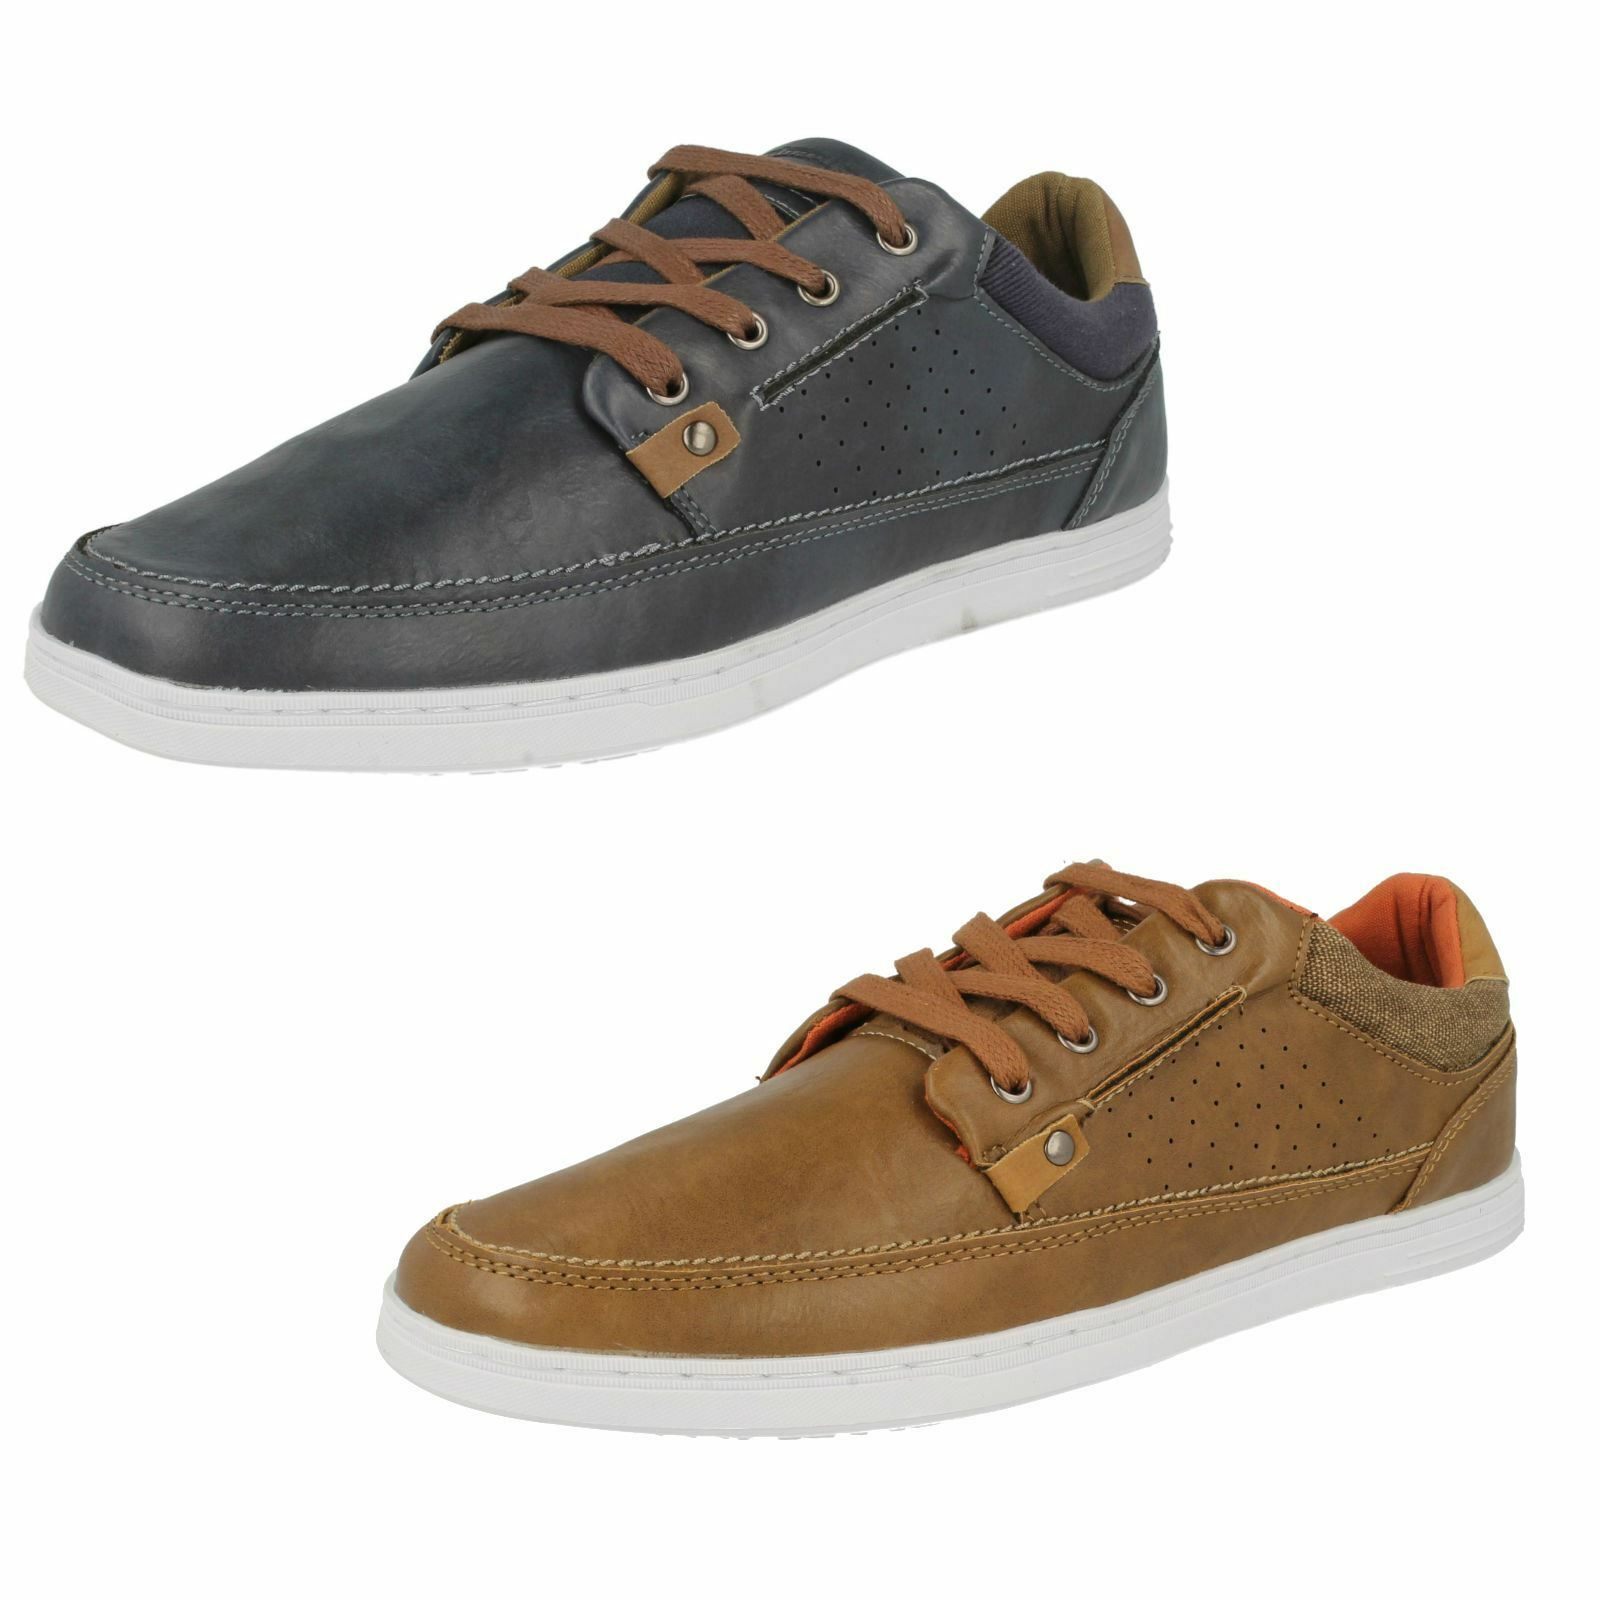 Mens Lambretta Casual Lace Up shoes - Spoons Lo